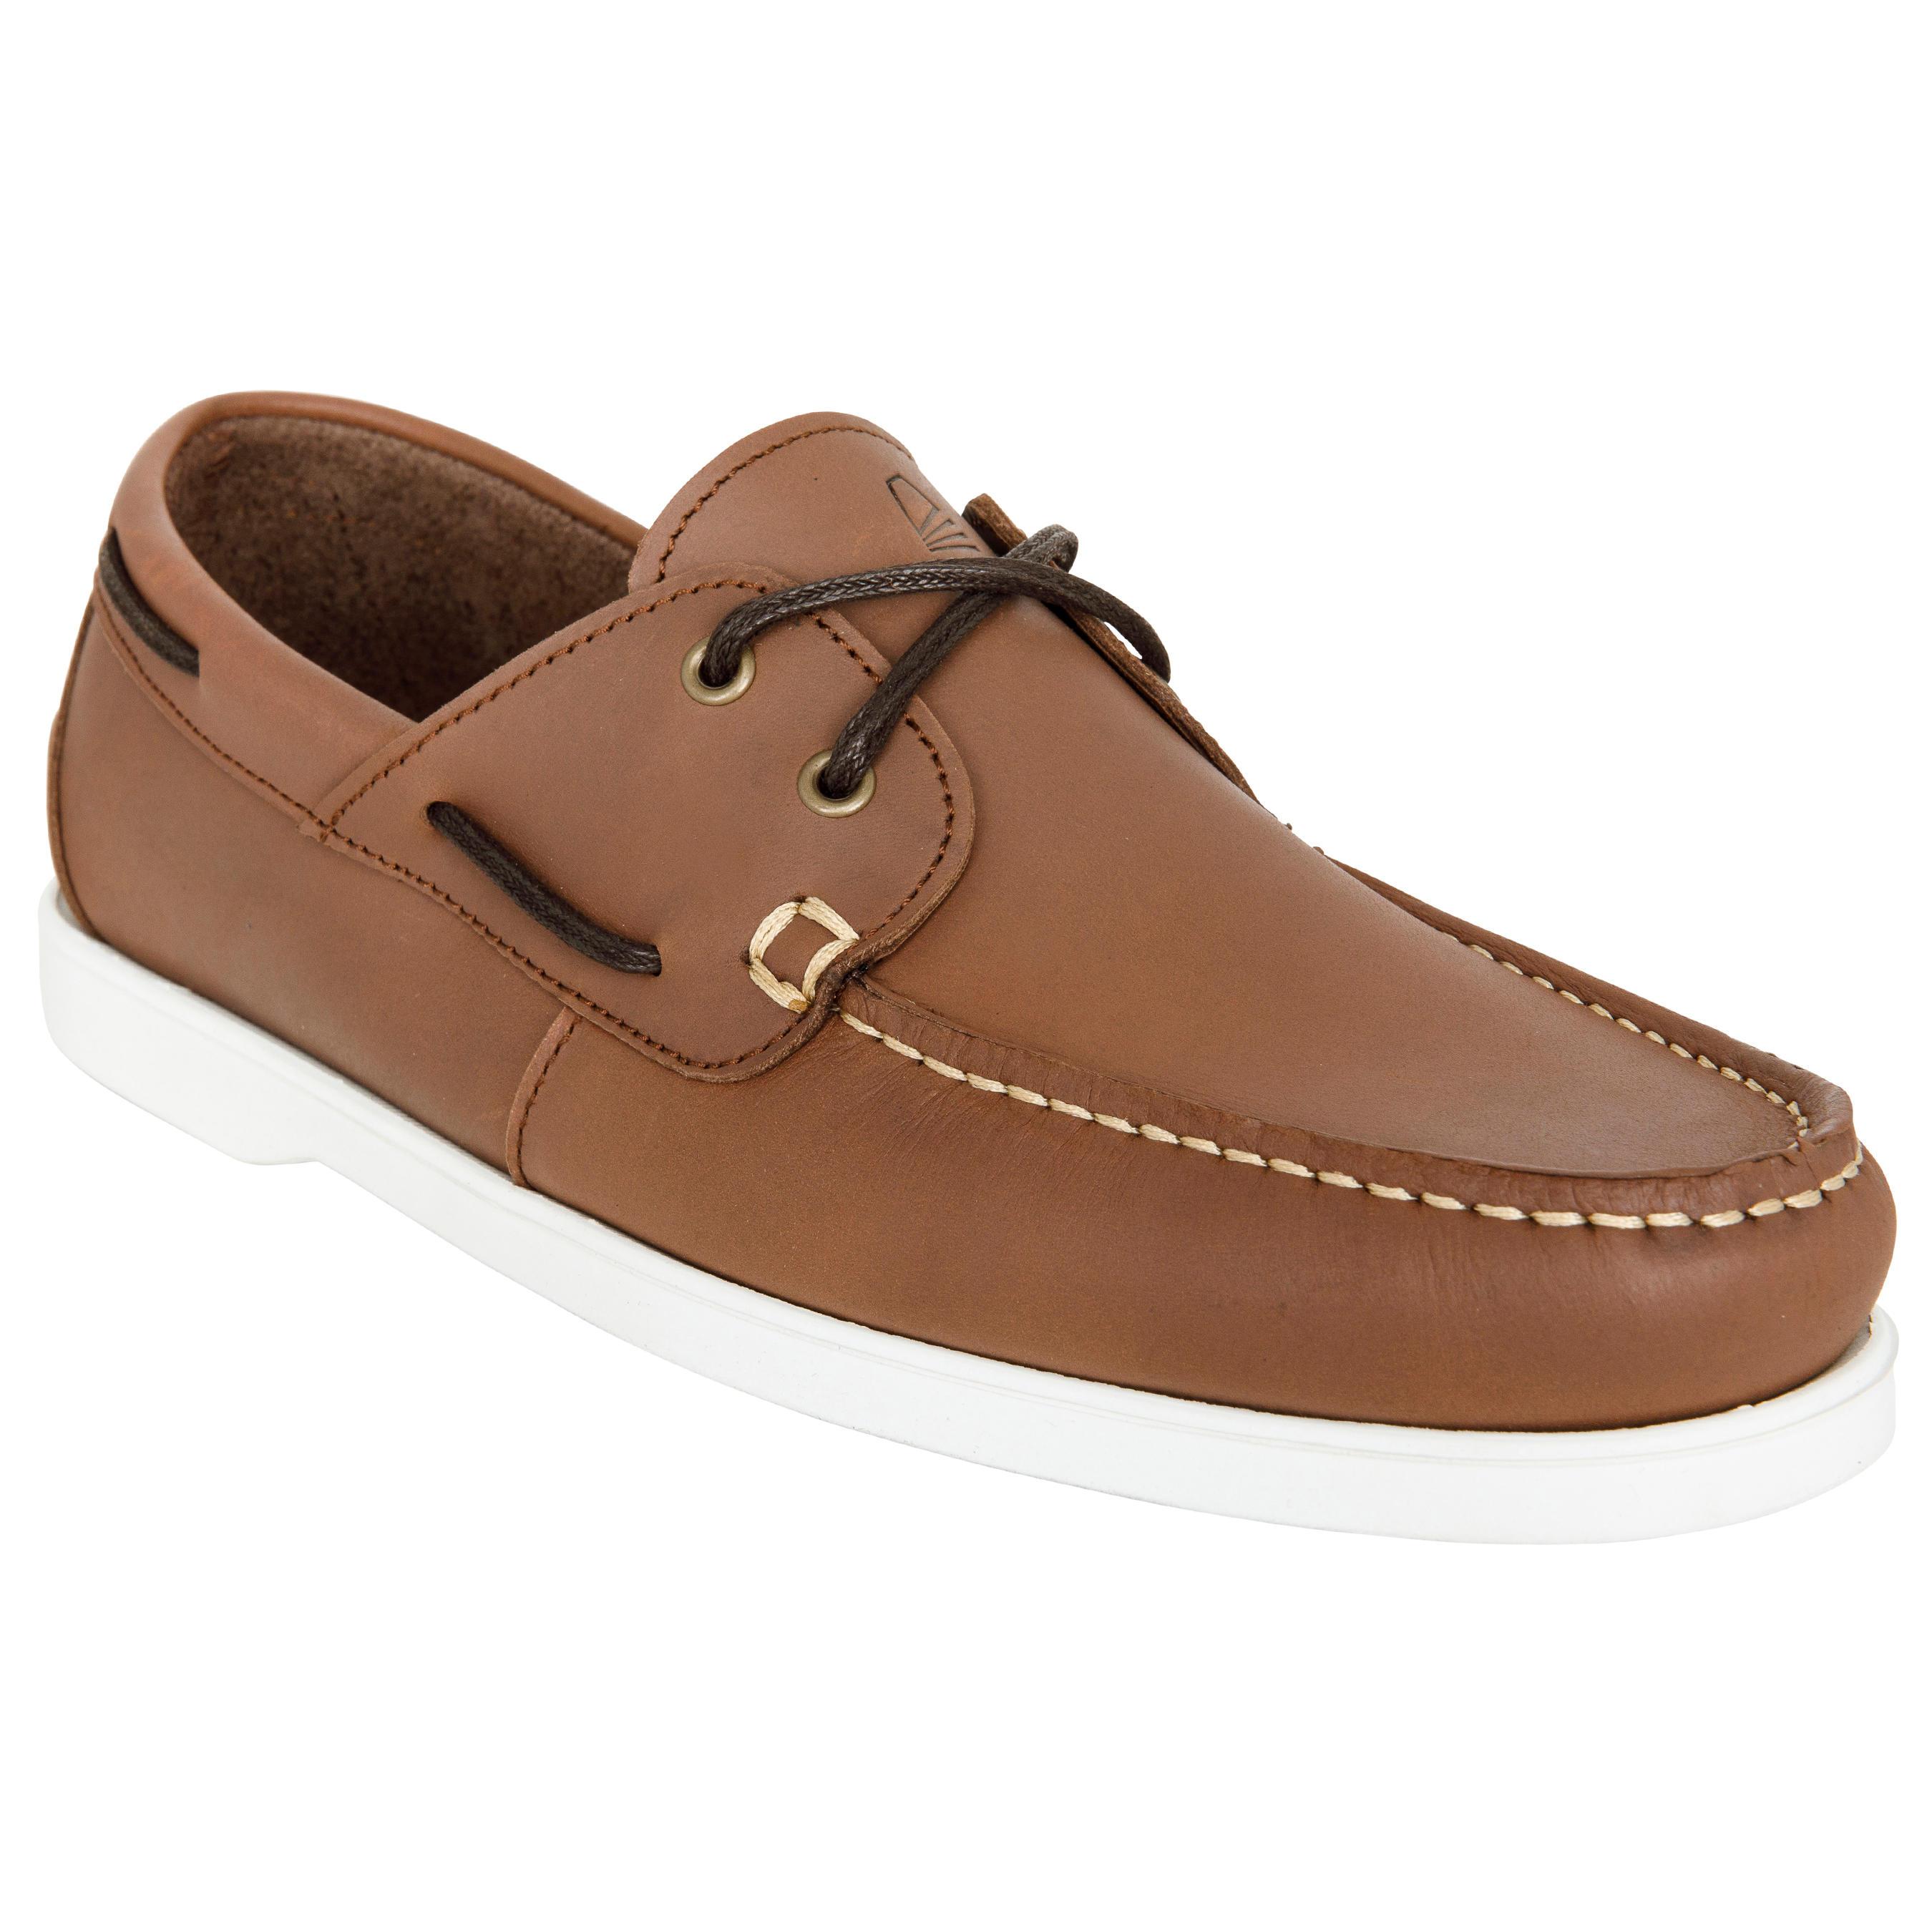 Chaussures bateau homme adhérentes CRUISE 500 marron blanc - Tribord